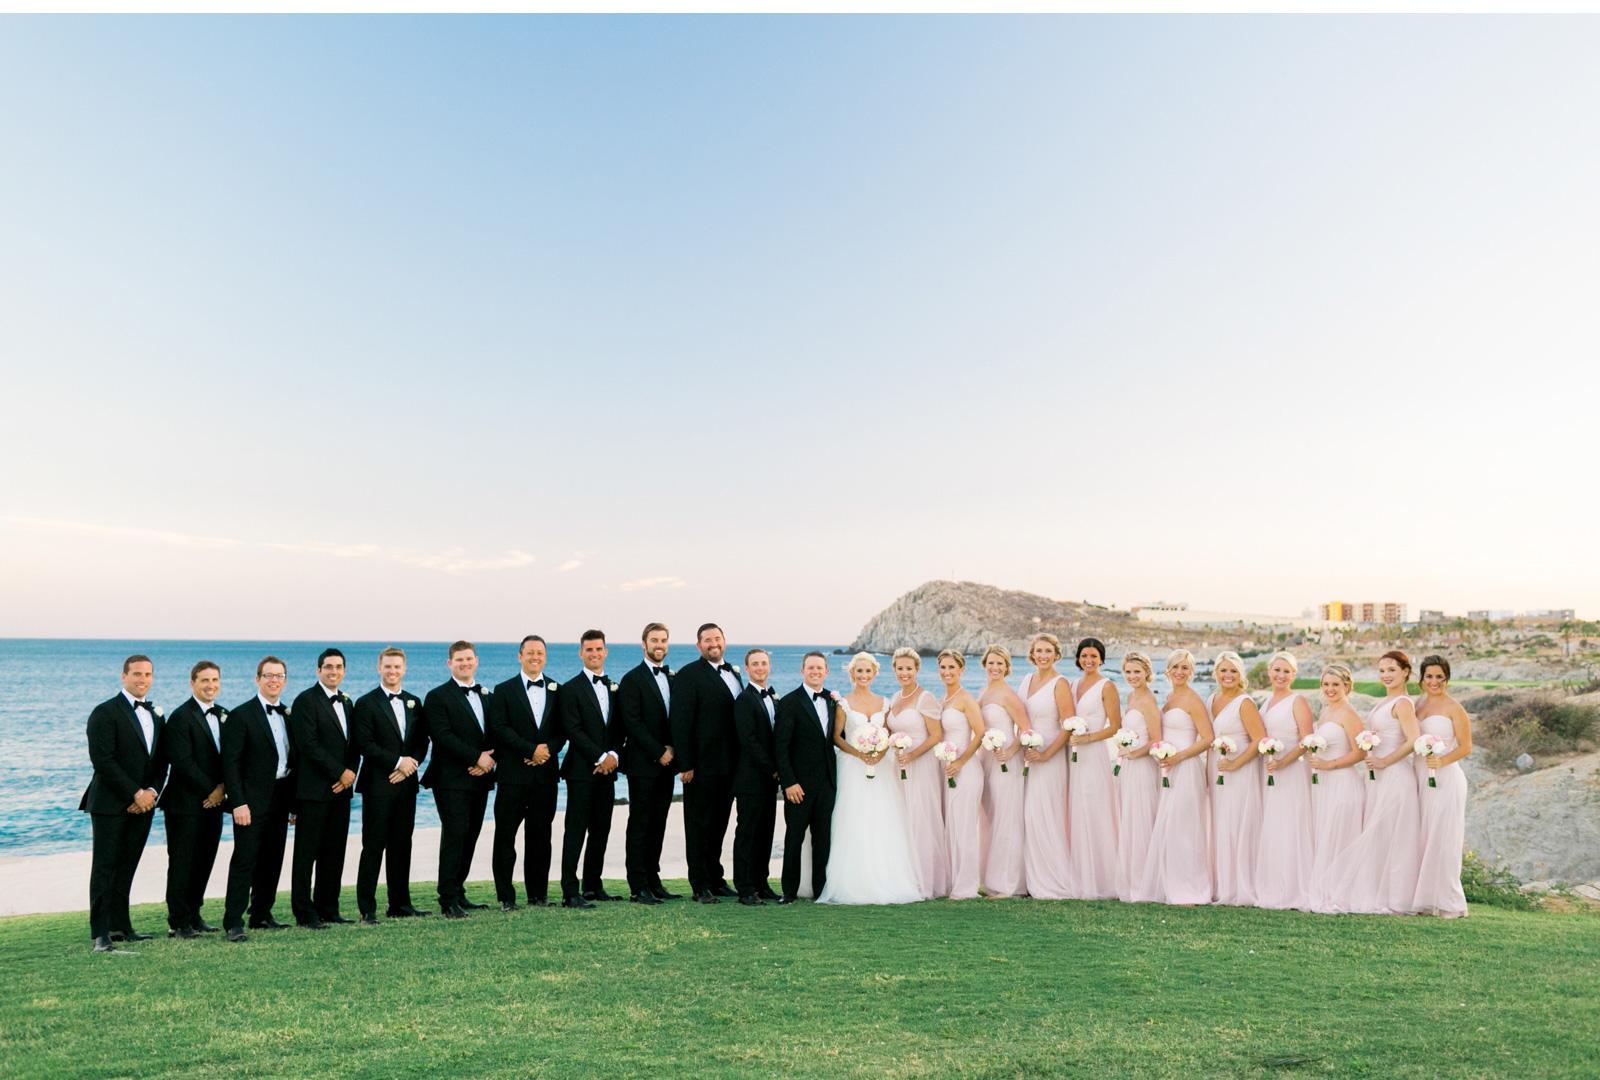 Hawaii-Destination-Wedding-Natalie-Schutt-Photography-Style-Me-Pretty_07.jpg